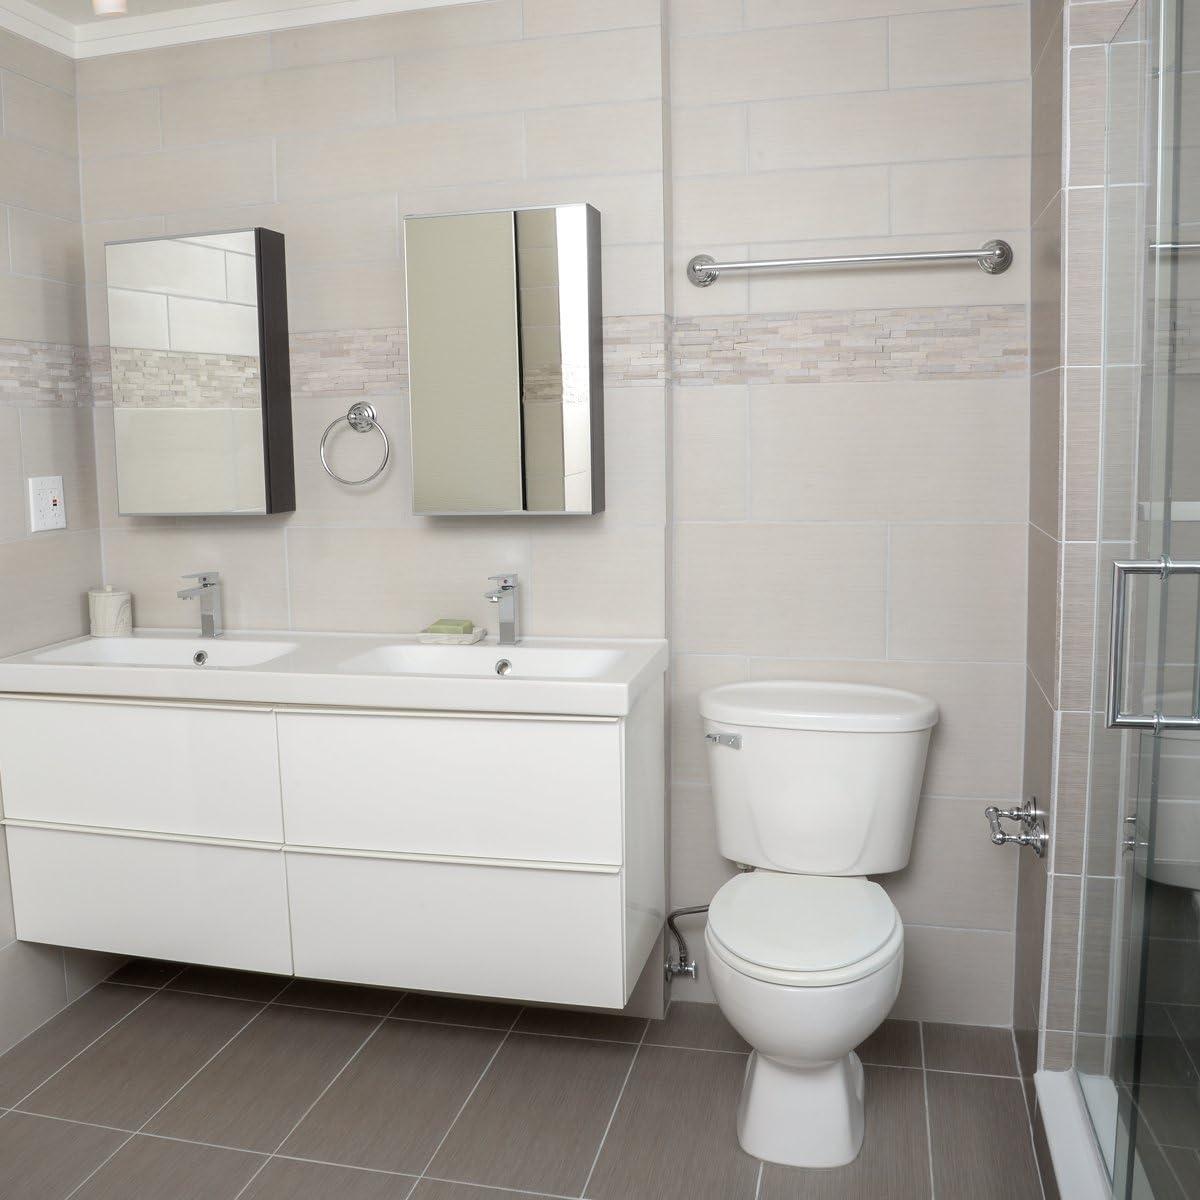 3 Piece Basics Modern Bathroom Accessories Set Satin Nickel